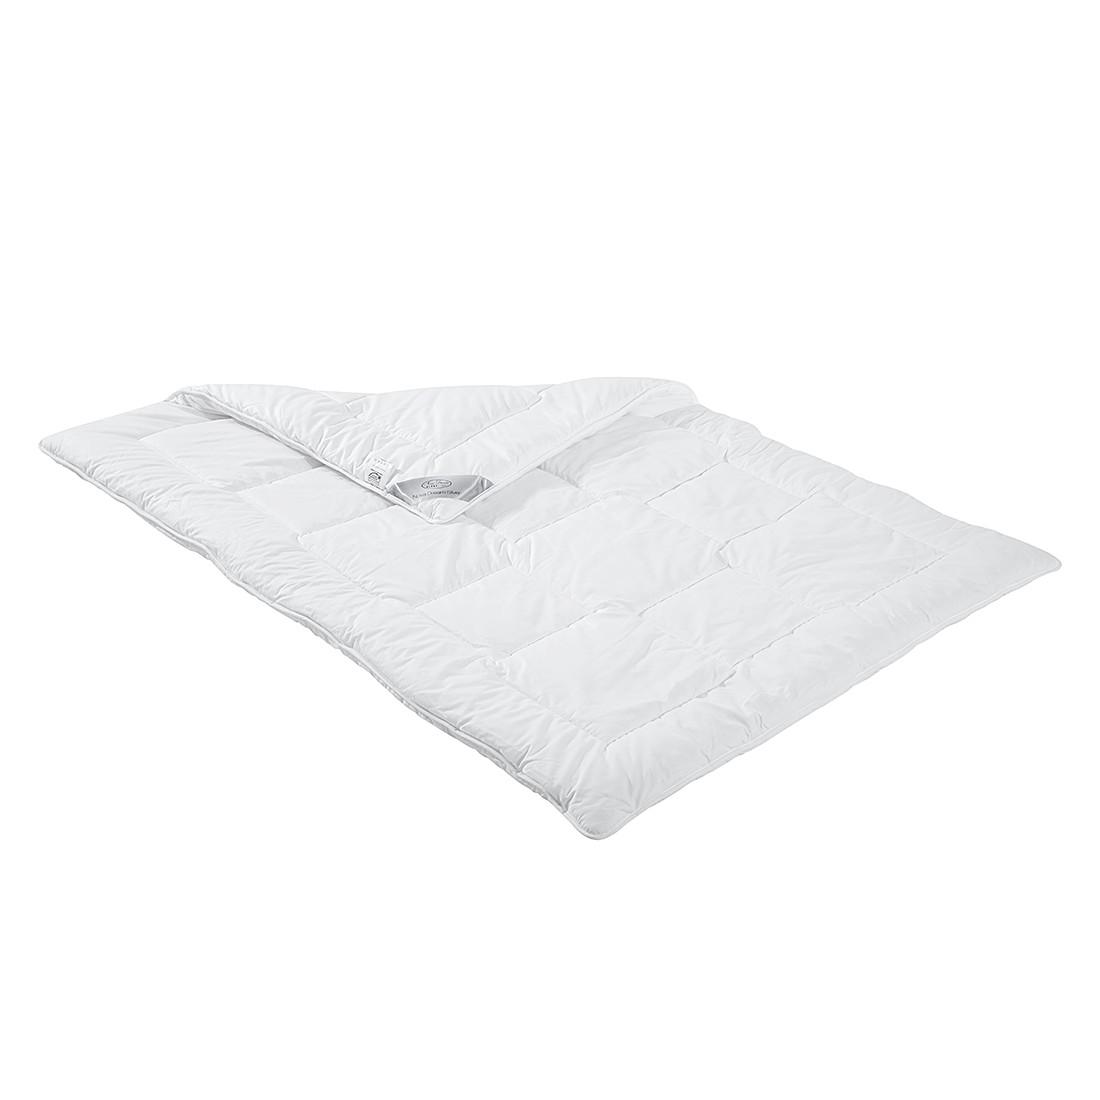 Bettdecke Nova Dream Silver – 135 x 200 cm – Warm, Nova Dream Sleepline jetzt bestellen